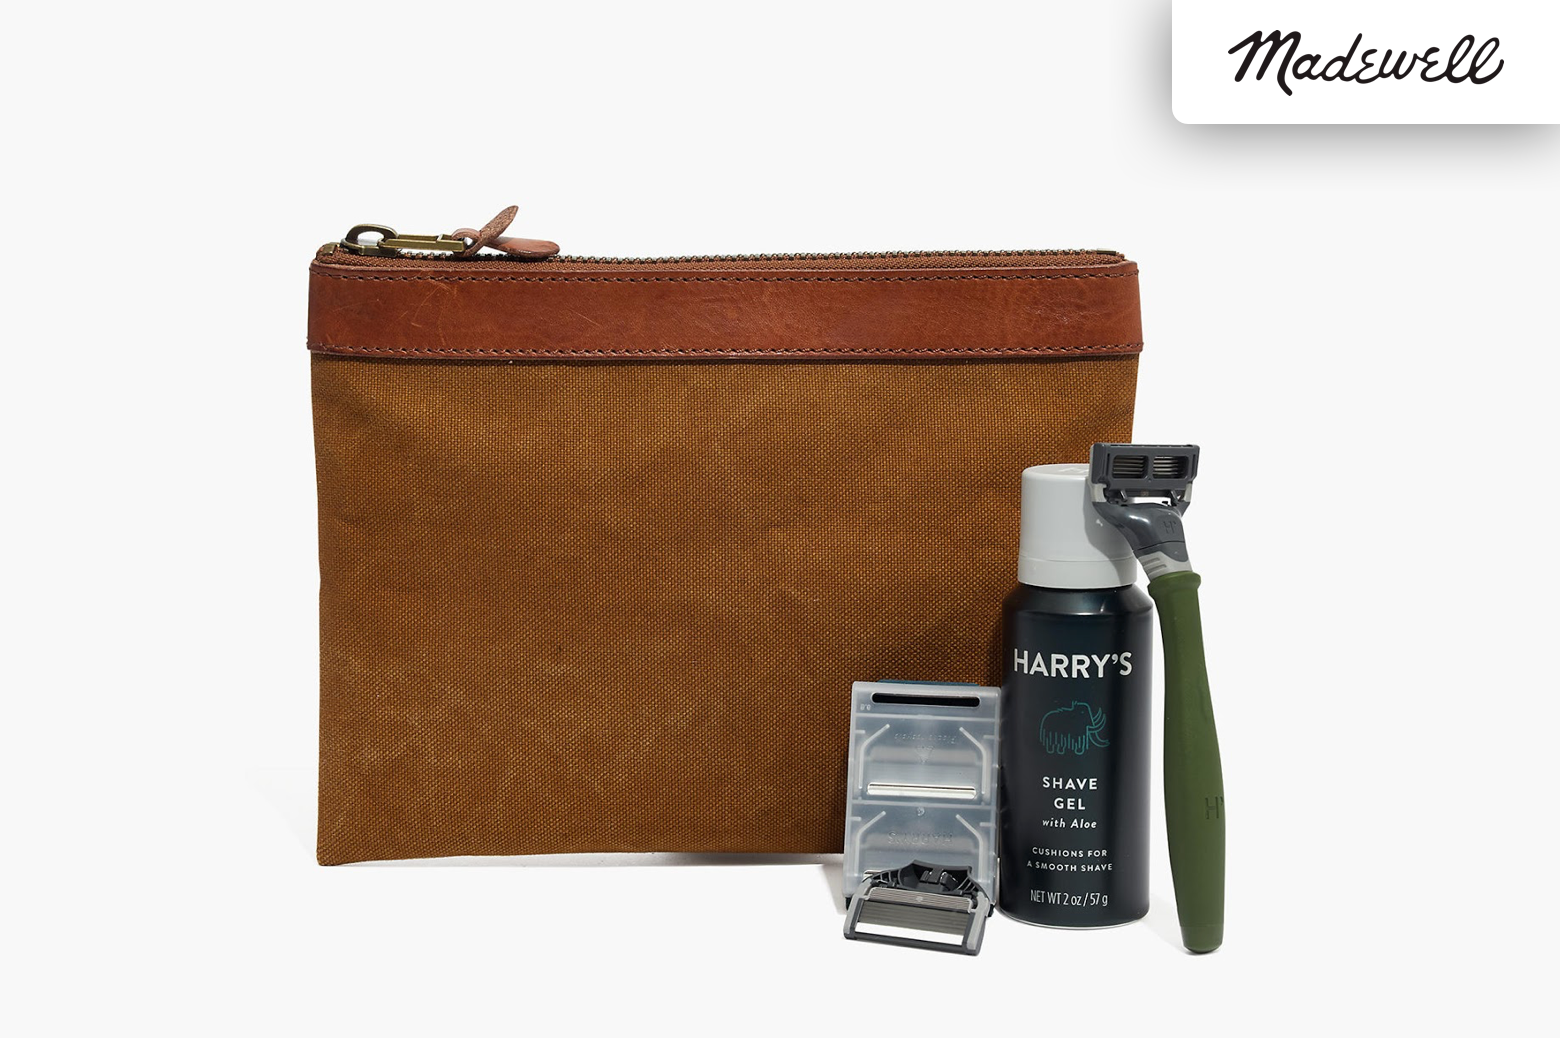 Madewell and Harry's stylish shaving kit